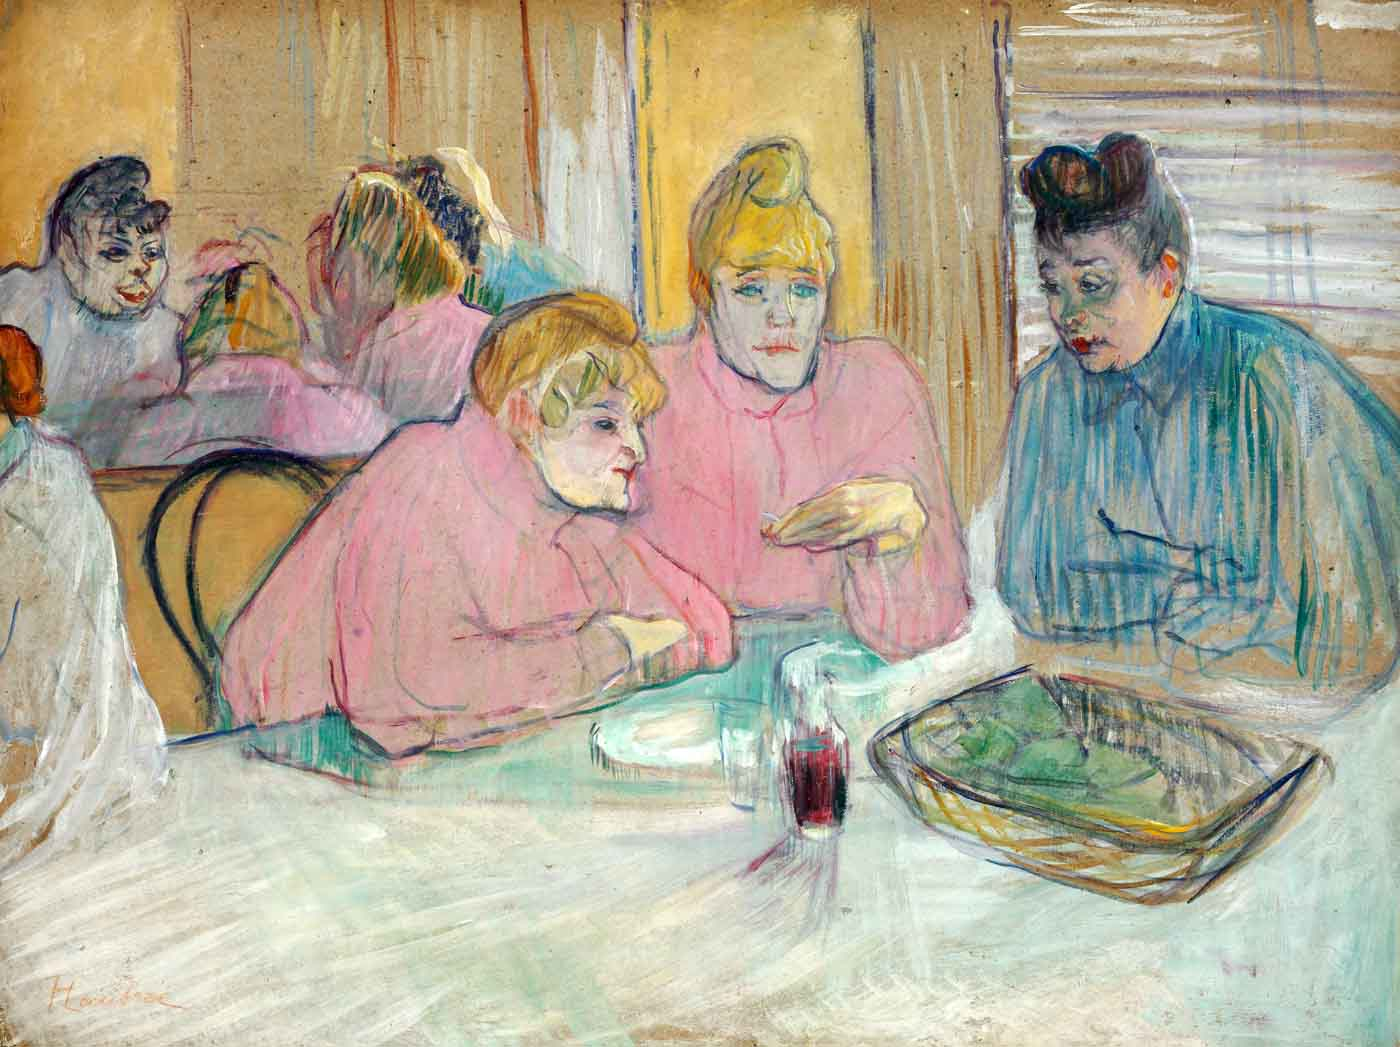 Henri de Toulouse-Lautrec u bečkom Kunstforumu